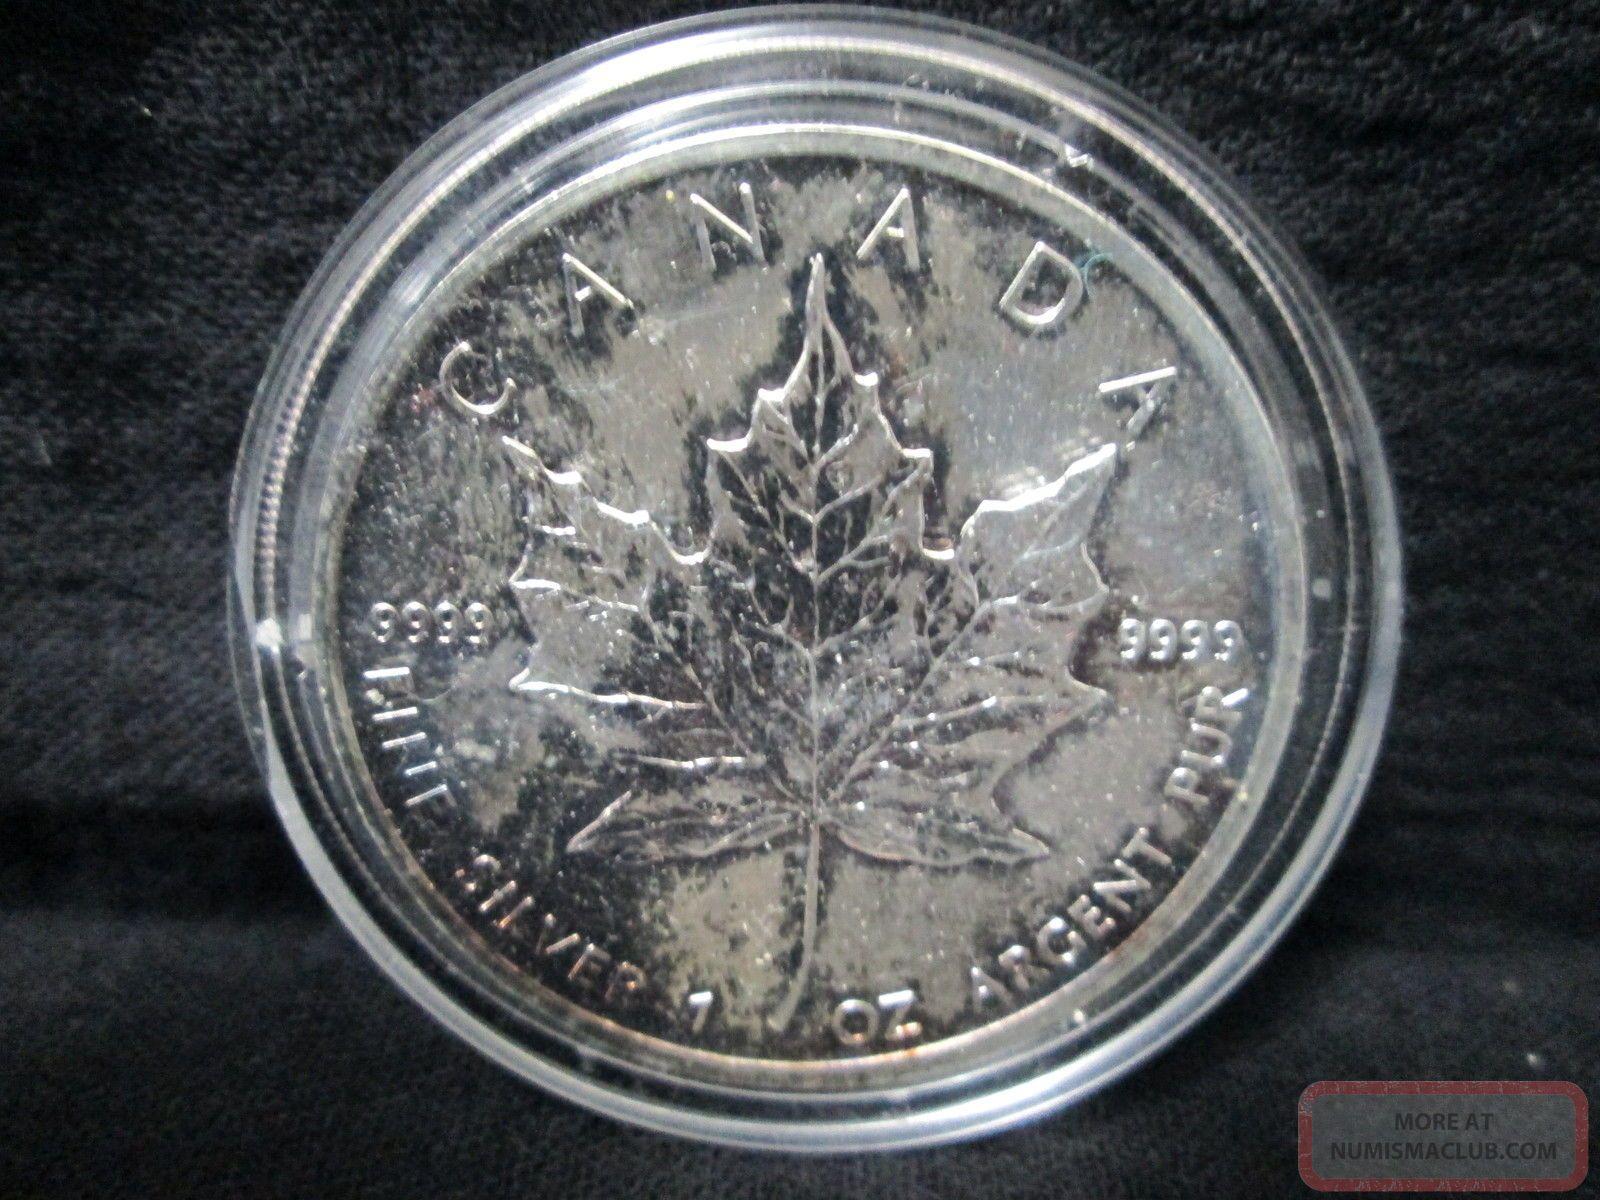 5 Dollars Elizabeth Ii 9999 Silver Proof Coin Canada 1989